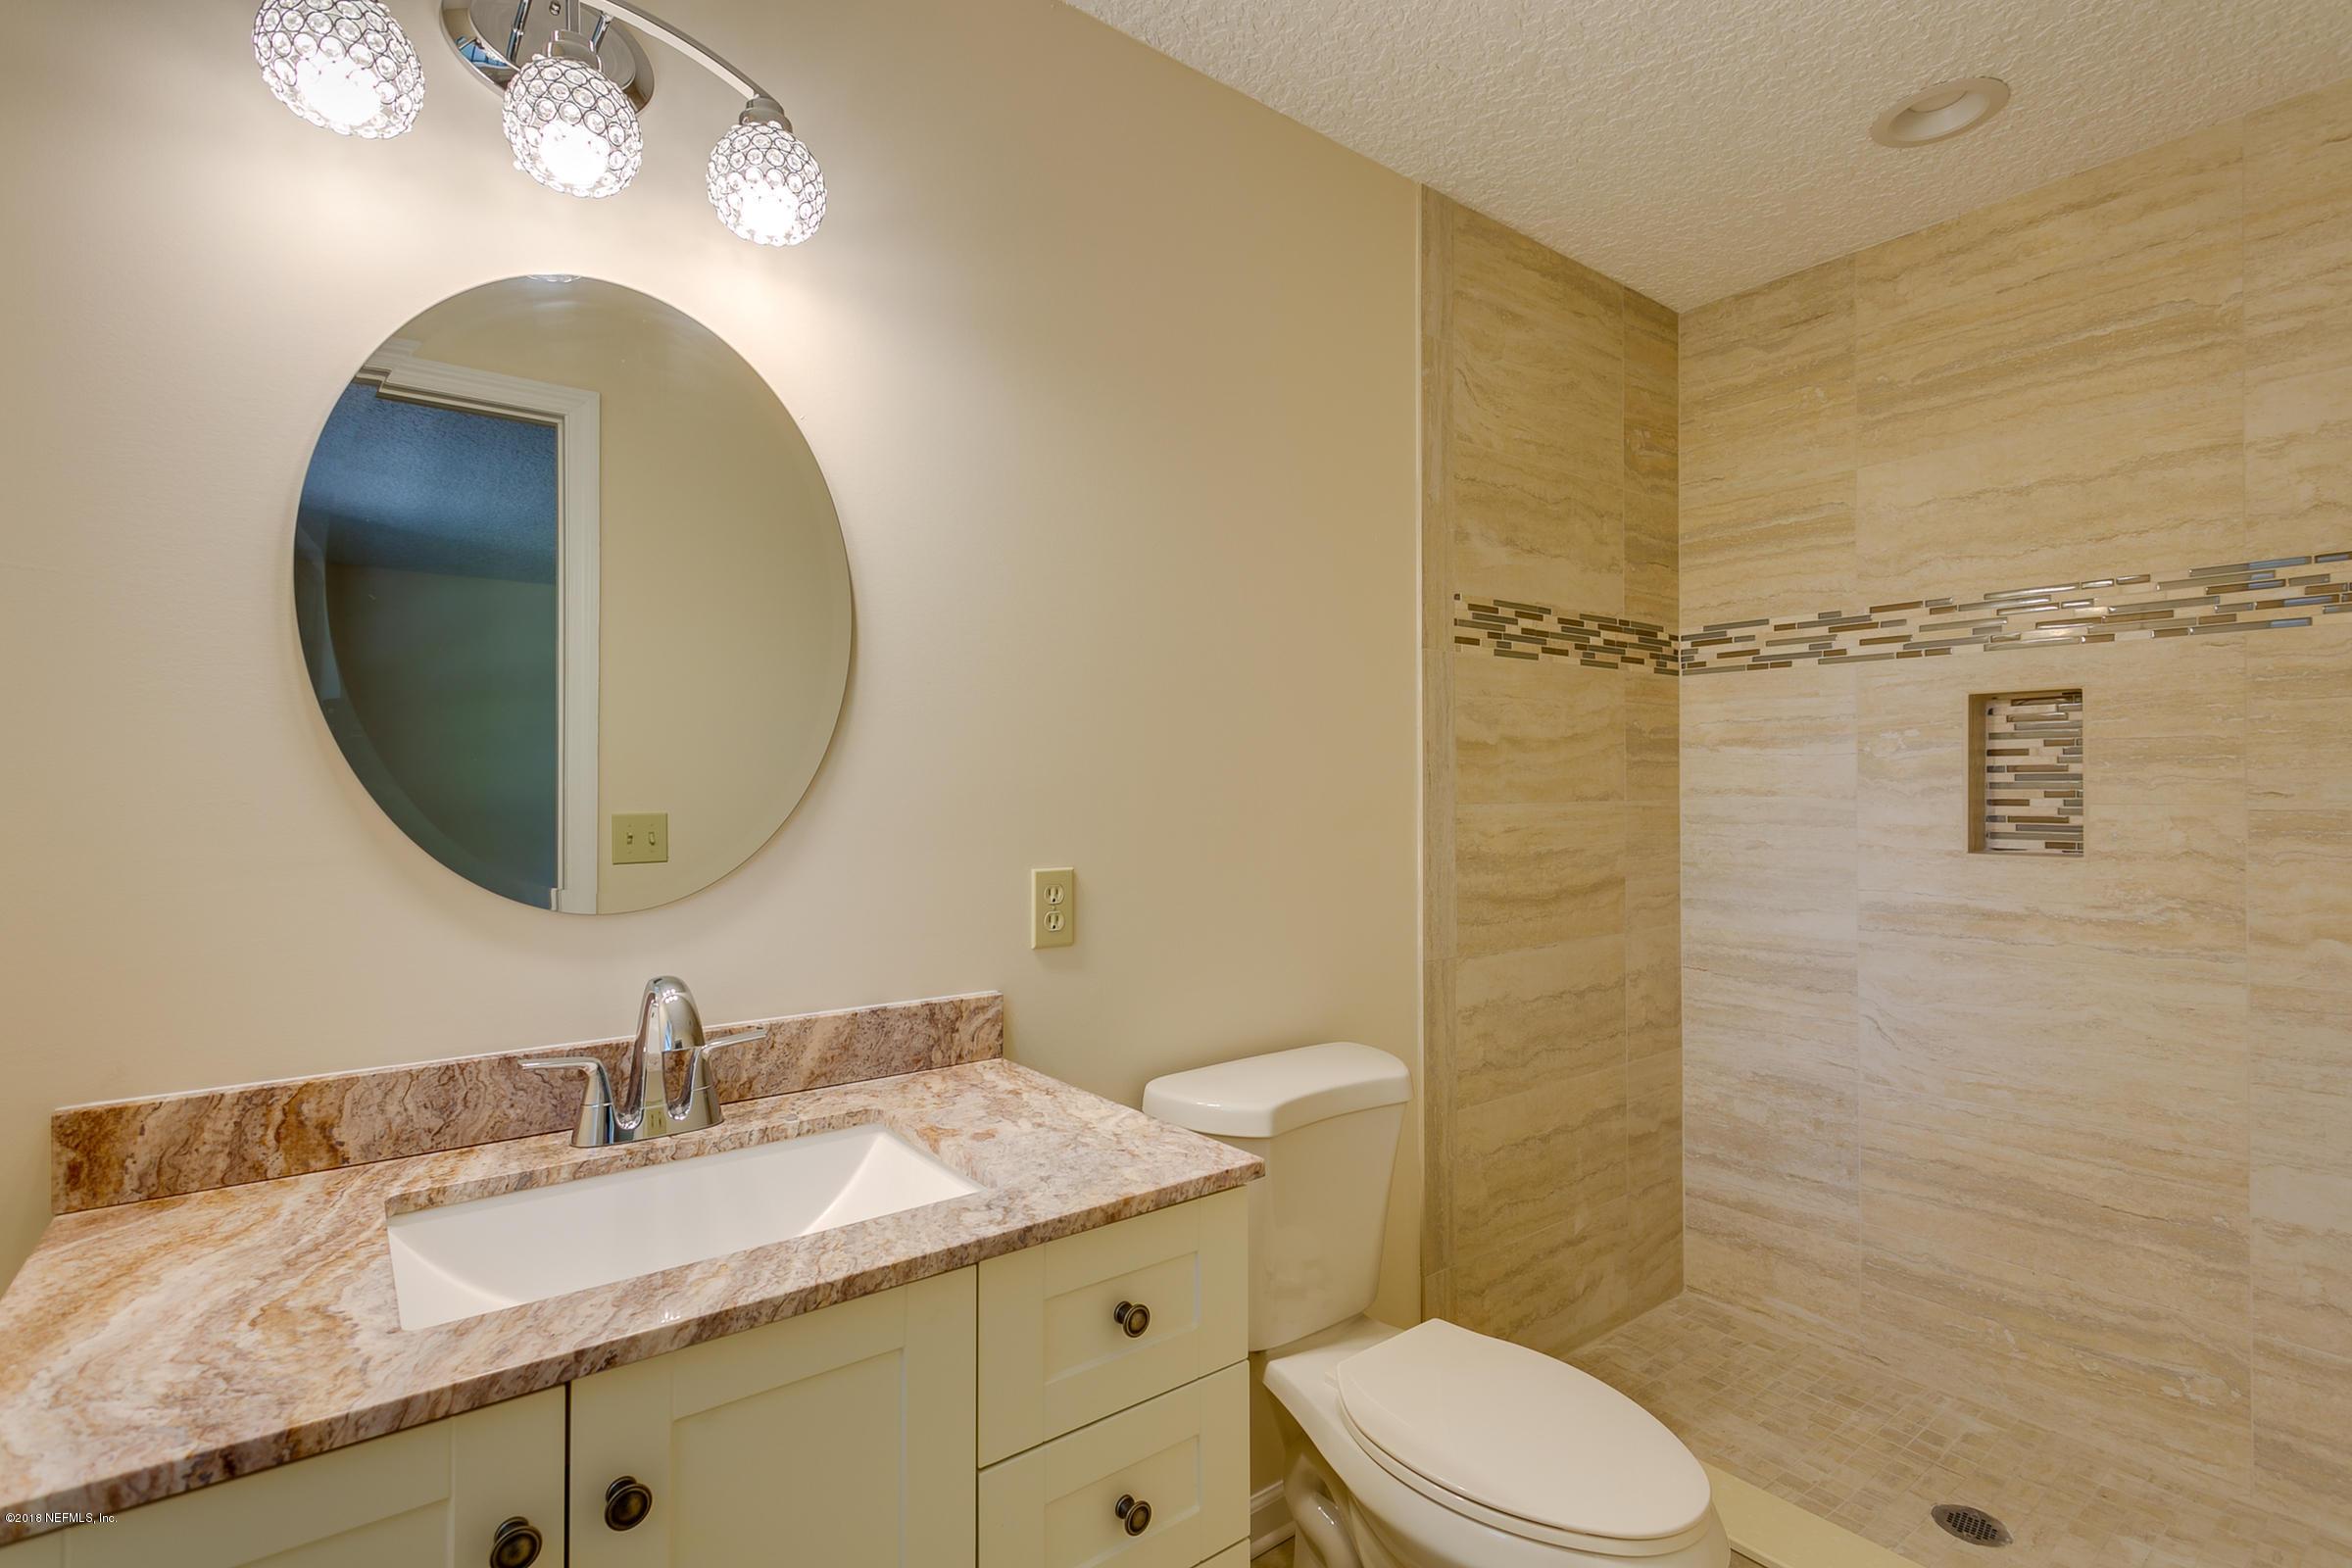 3194 CREIGHTON LANDING, FLEMING ISLAND, FLORIDA 32003, 3 Bedrooms Bedrooms, ,2 BathroomsBathrooms,Residential - single family,For sale,CREIGHTON LANDING,935554